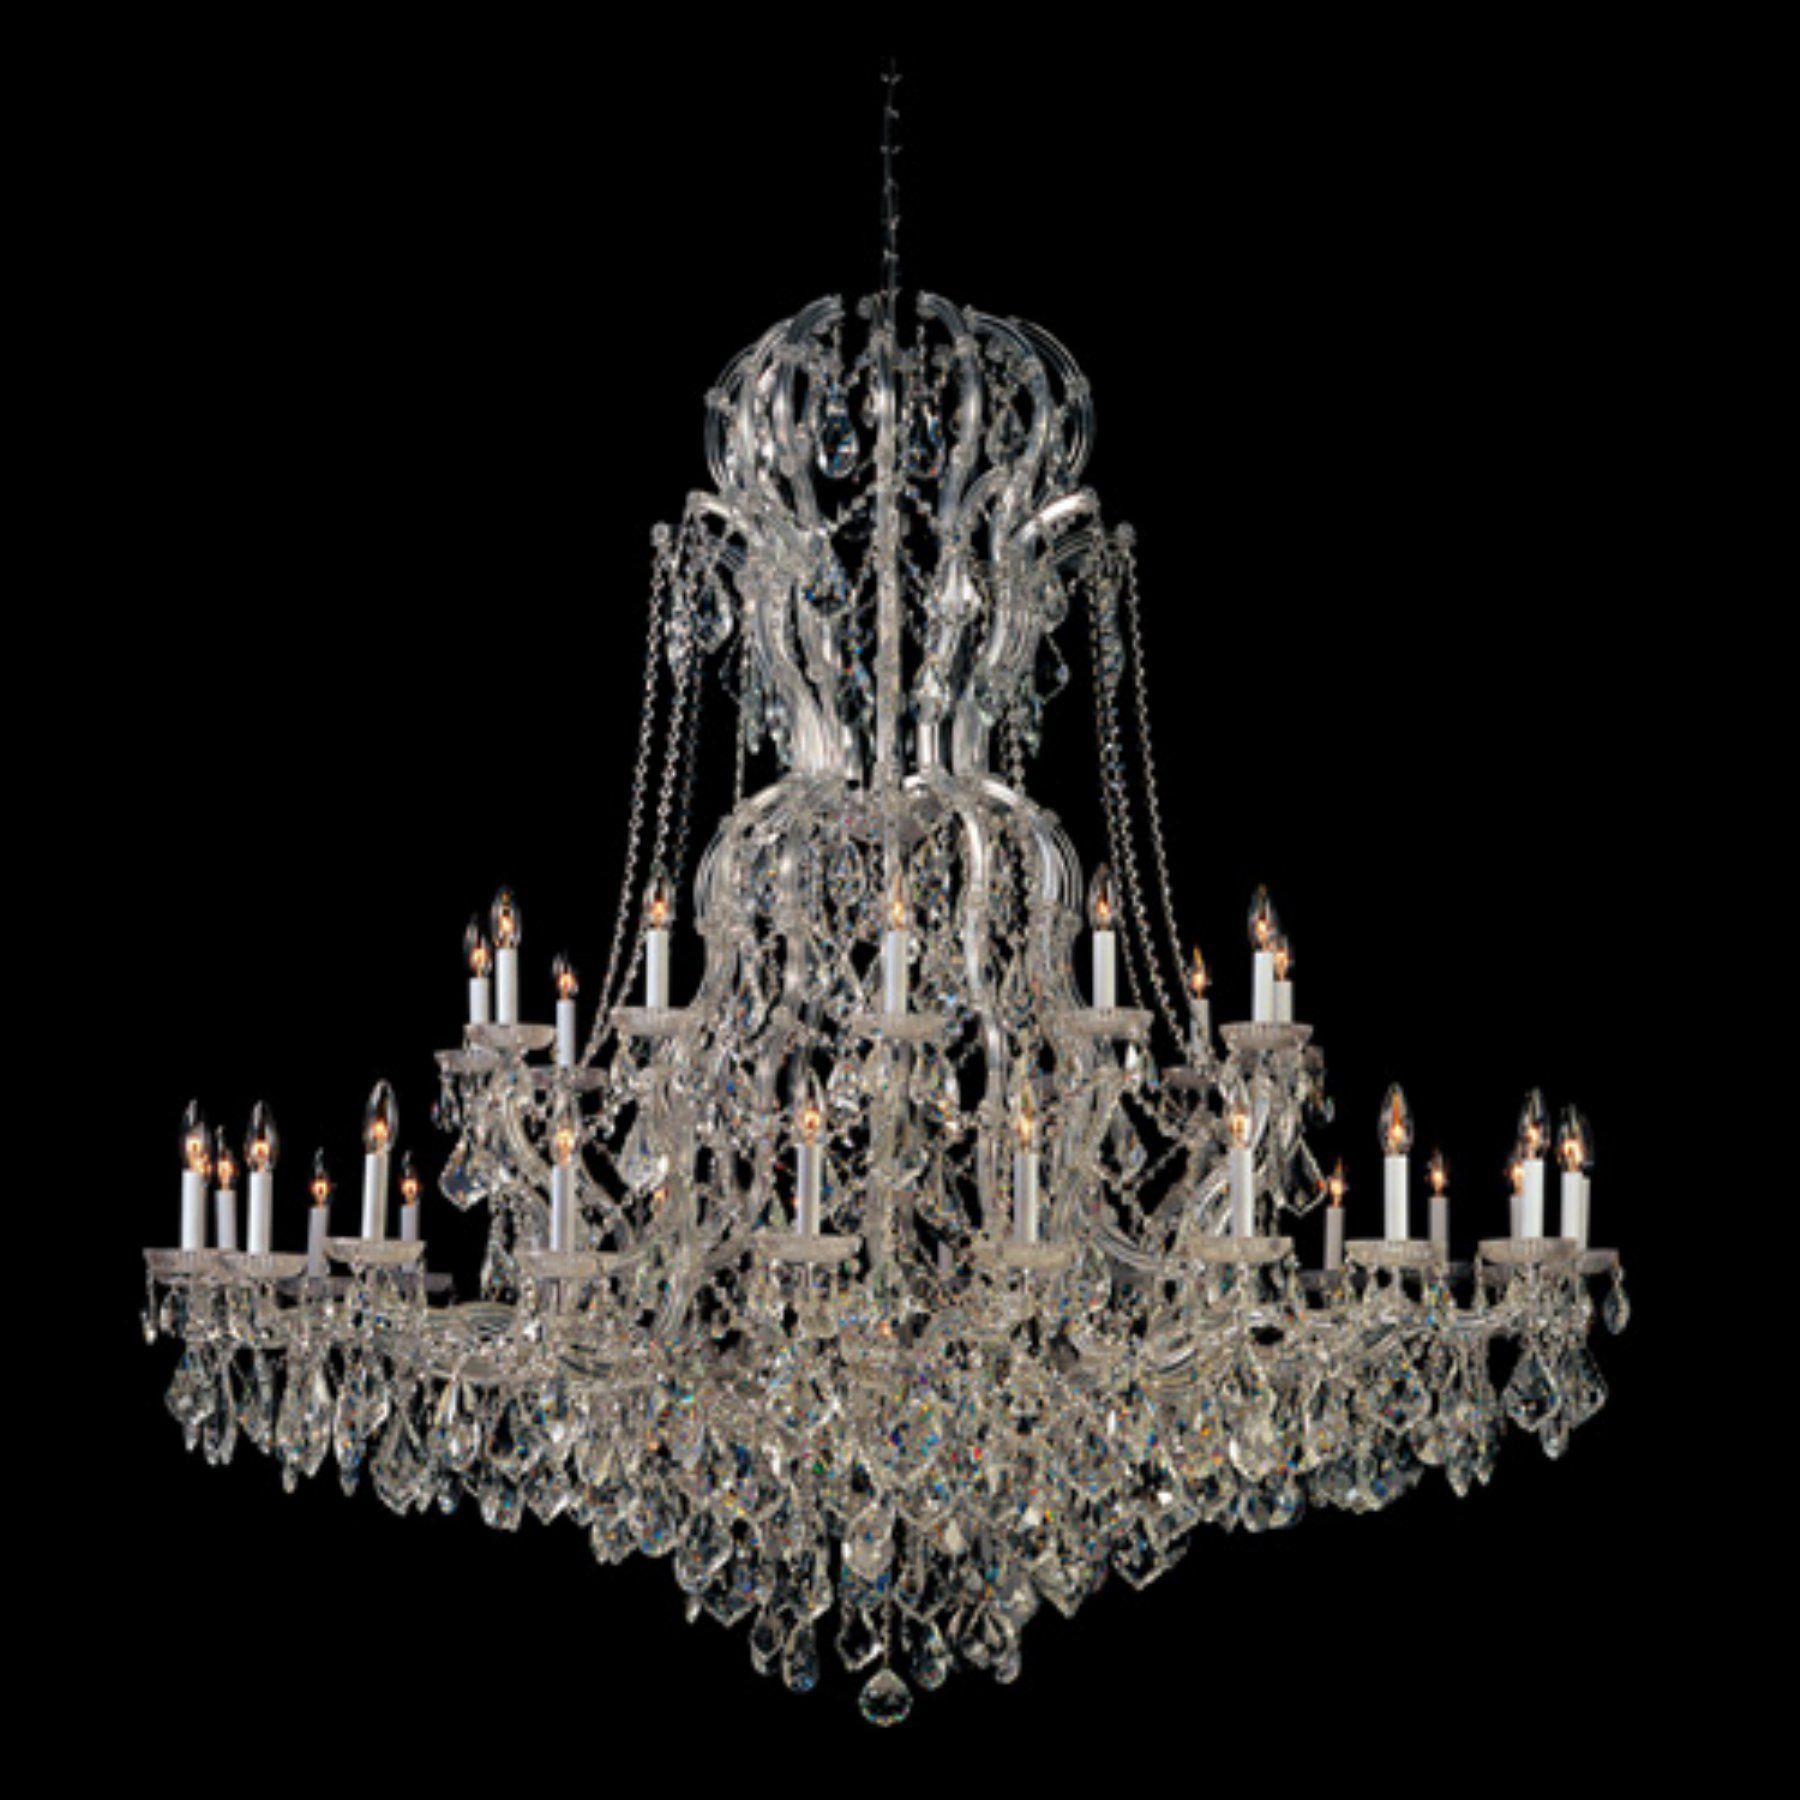 Crystorama maria theresa swarovski spectra chandelier 64w in crystorama maria theresa swarovski spectra chandelier 64w in 4460 ch cl arubaitofo Gallery